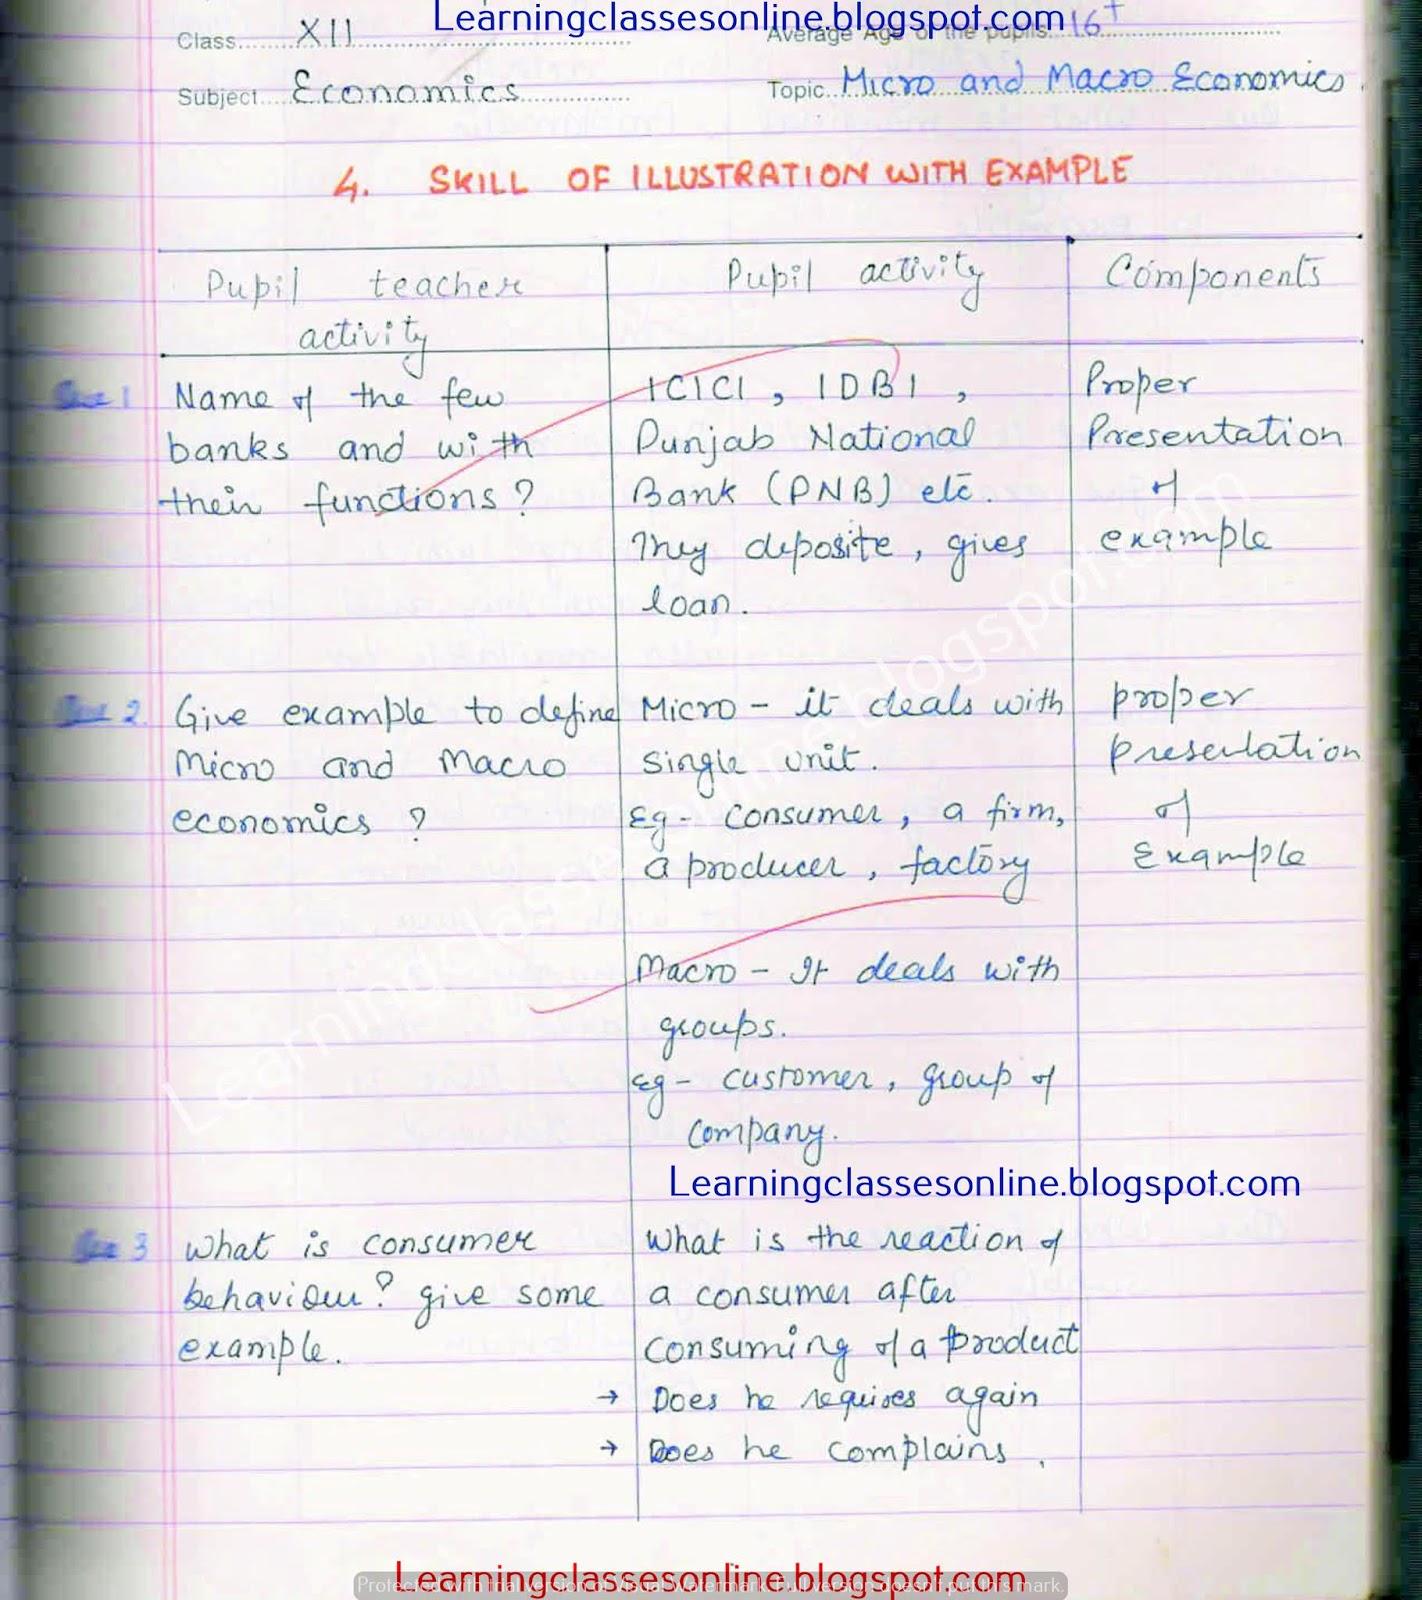 micro and macro economics b.ed lesson plan for teachers of high school